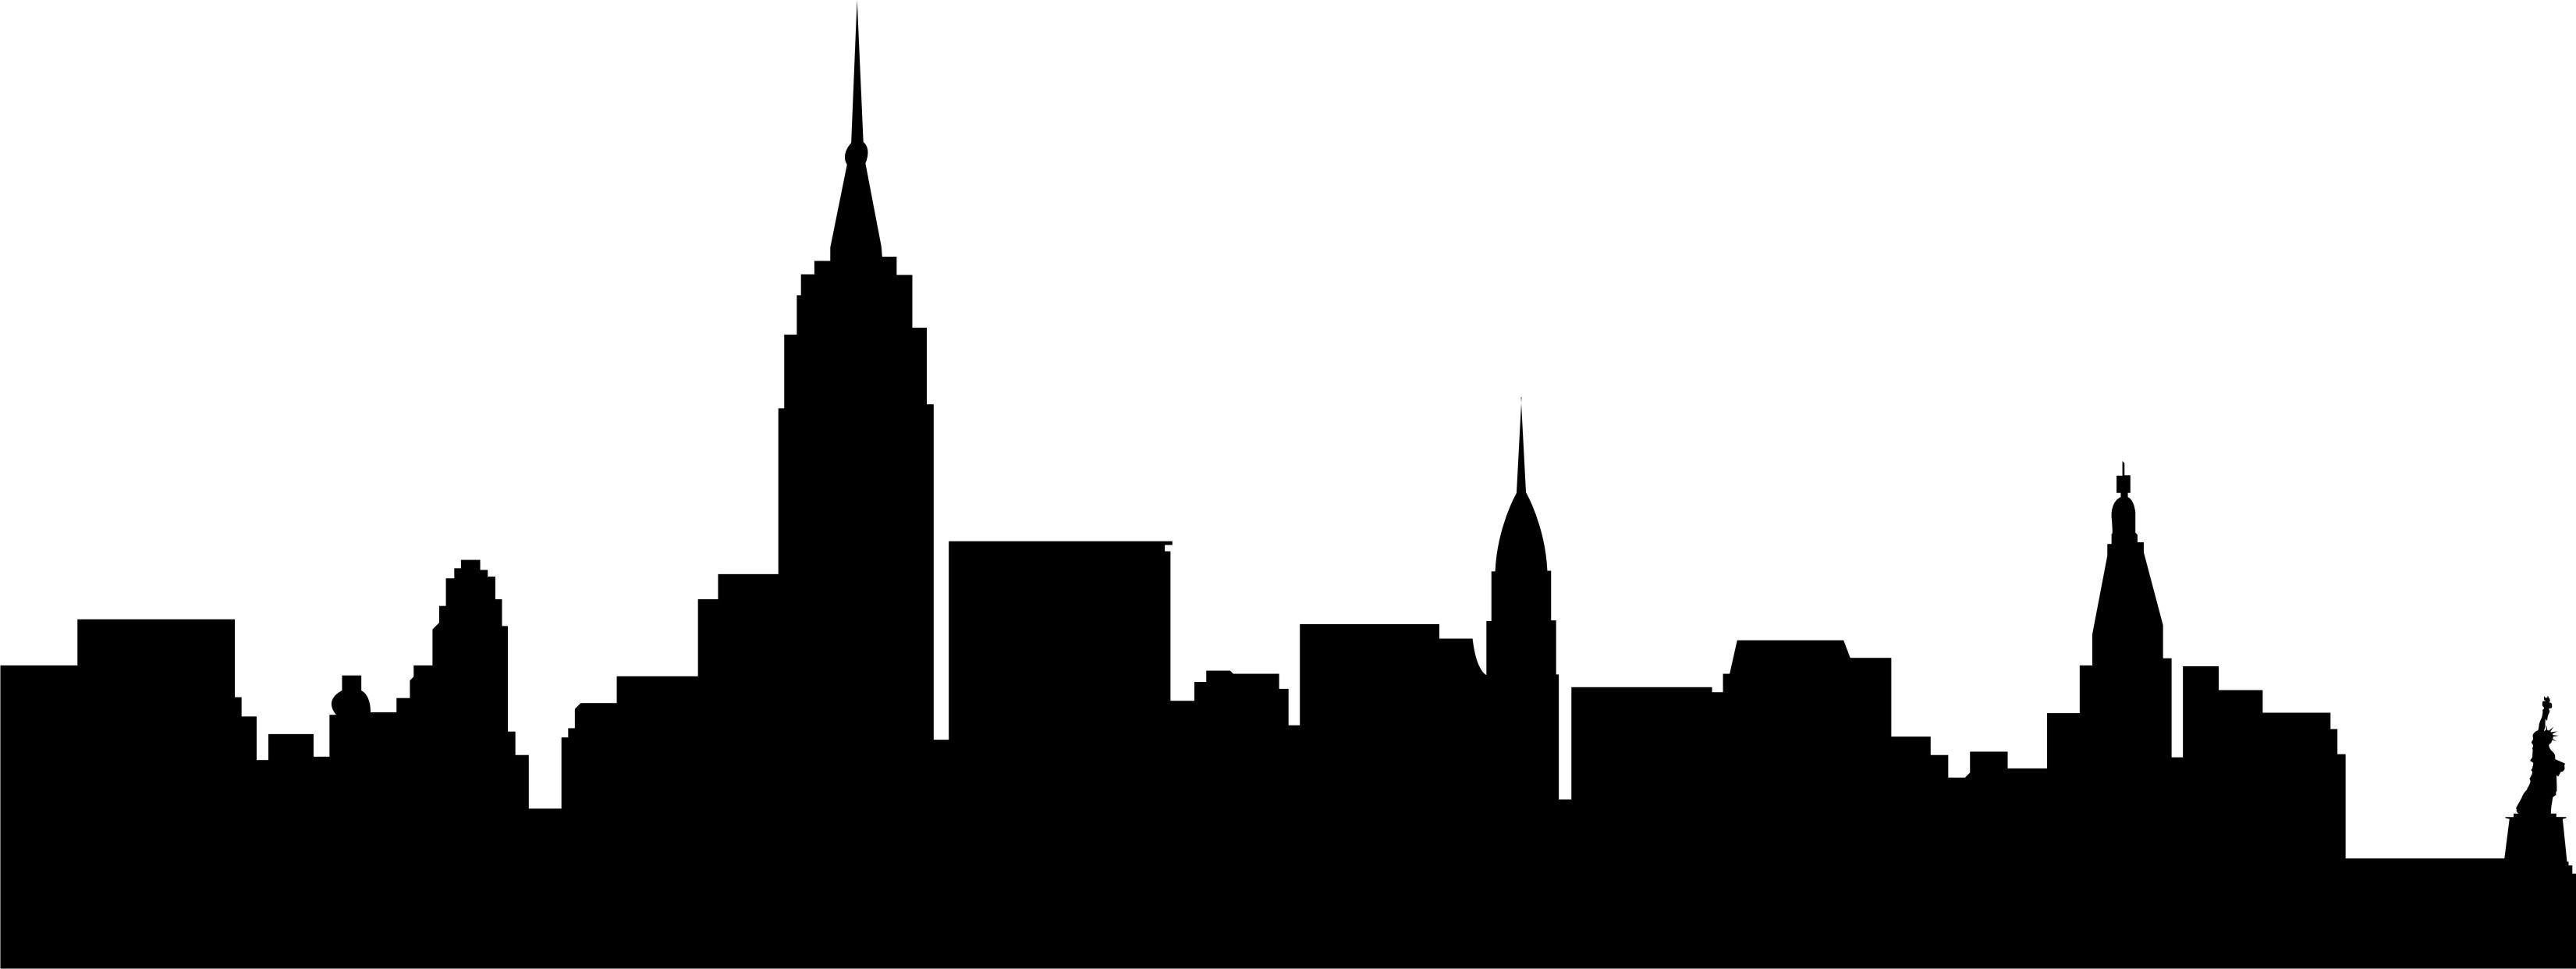 New york city skyline clipart clip art transparent stock Skyline Silhouette Clipart | Free download best Skyline Silhouette ... clip art transparent stock